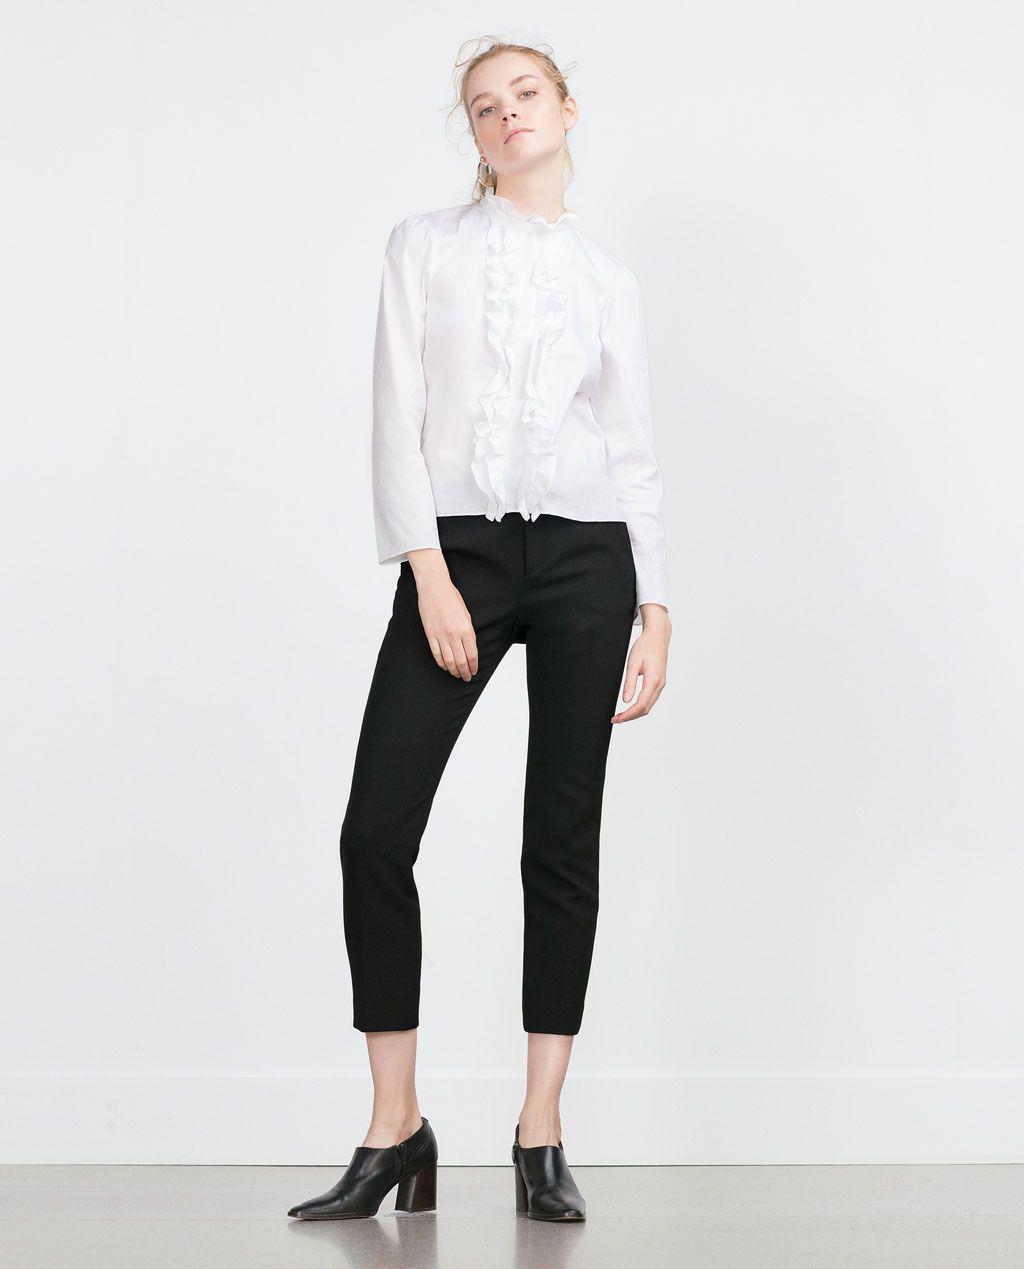 Pantalon Crep Pantalon Zara Mujer Mujer PitilloPantalones PitilloPantalones Crep Zara Zara Crep Mujer Pantalon BrdCoxe